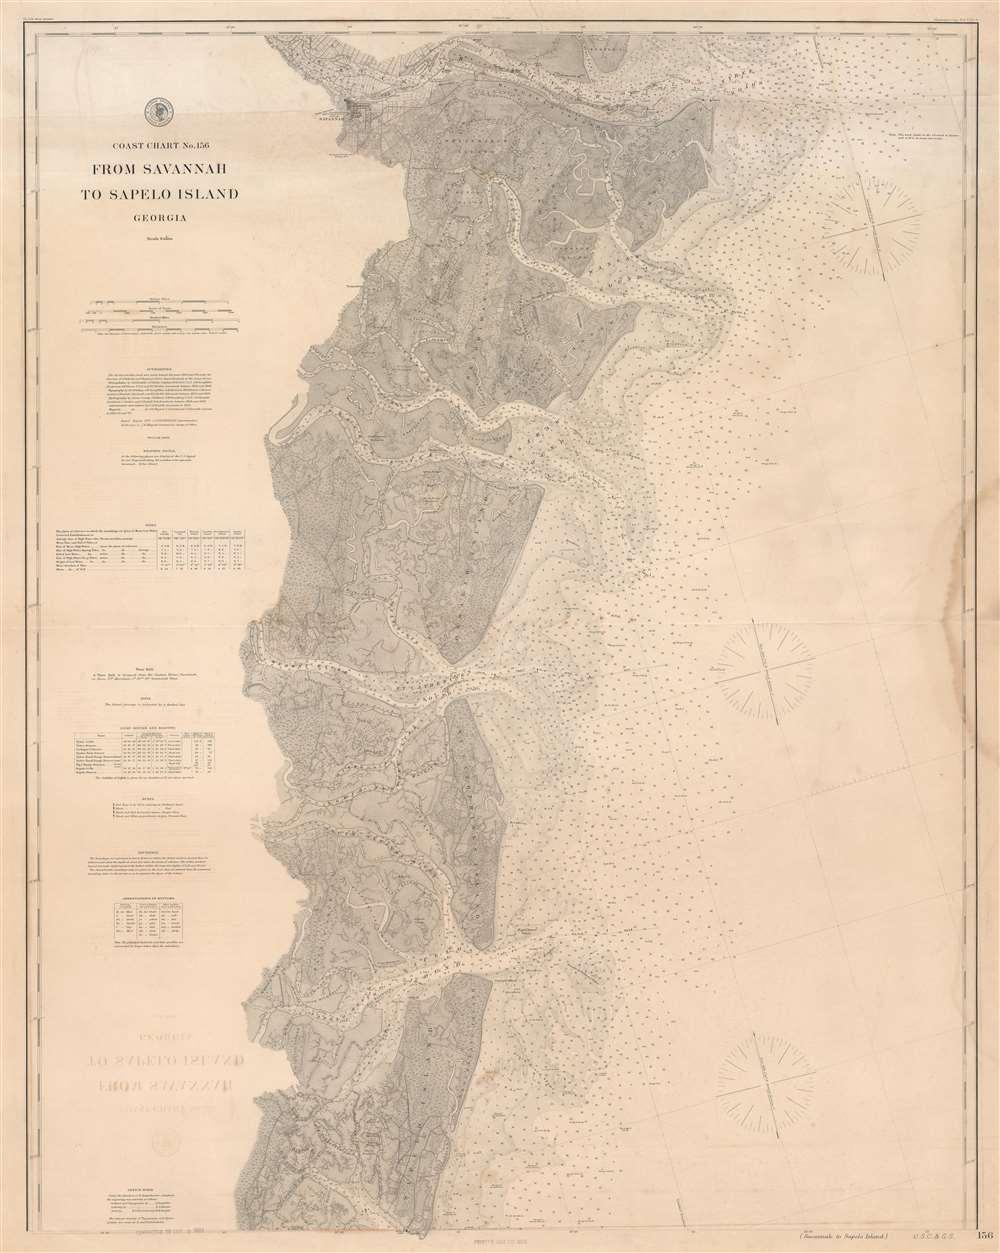 Coast Chart No. 156 From Savannah to Sapelo Island Georgia. - Main View